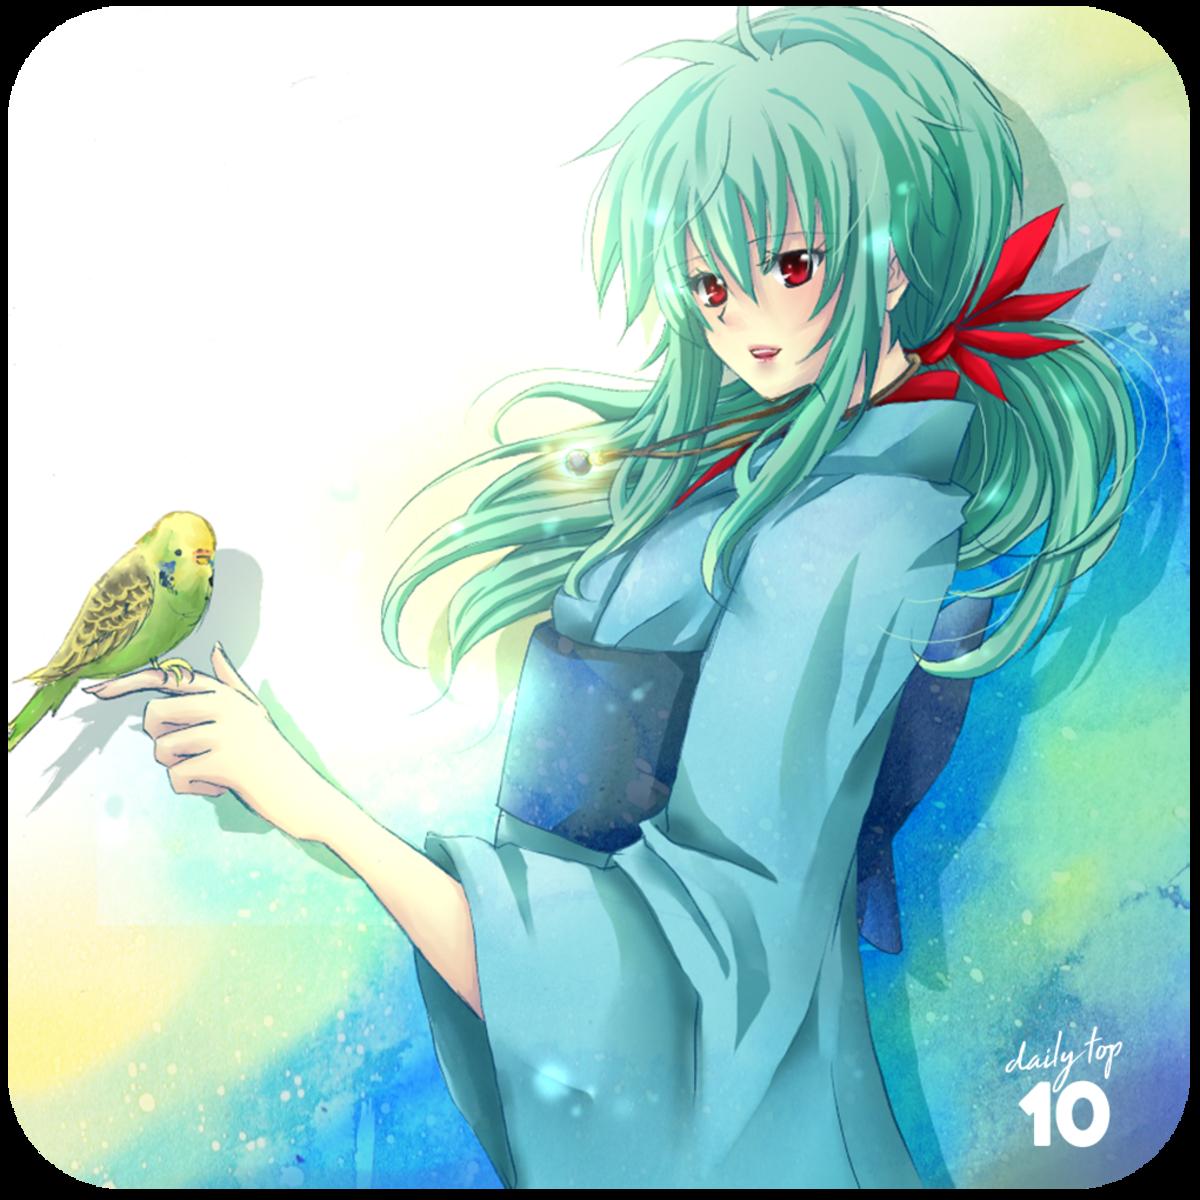 Yukina with a cute bird.